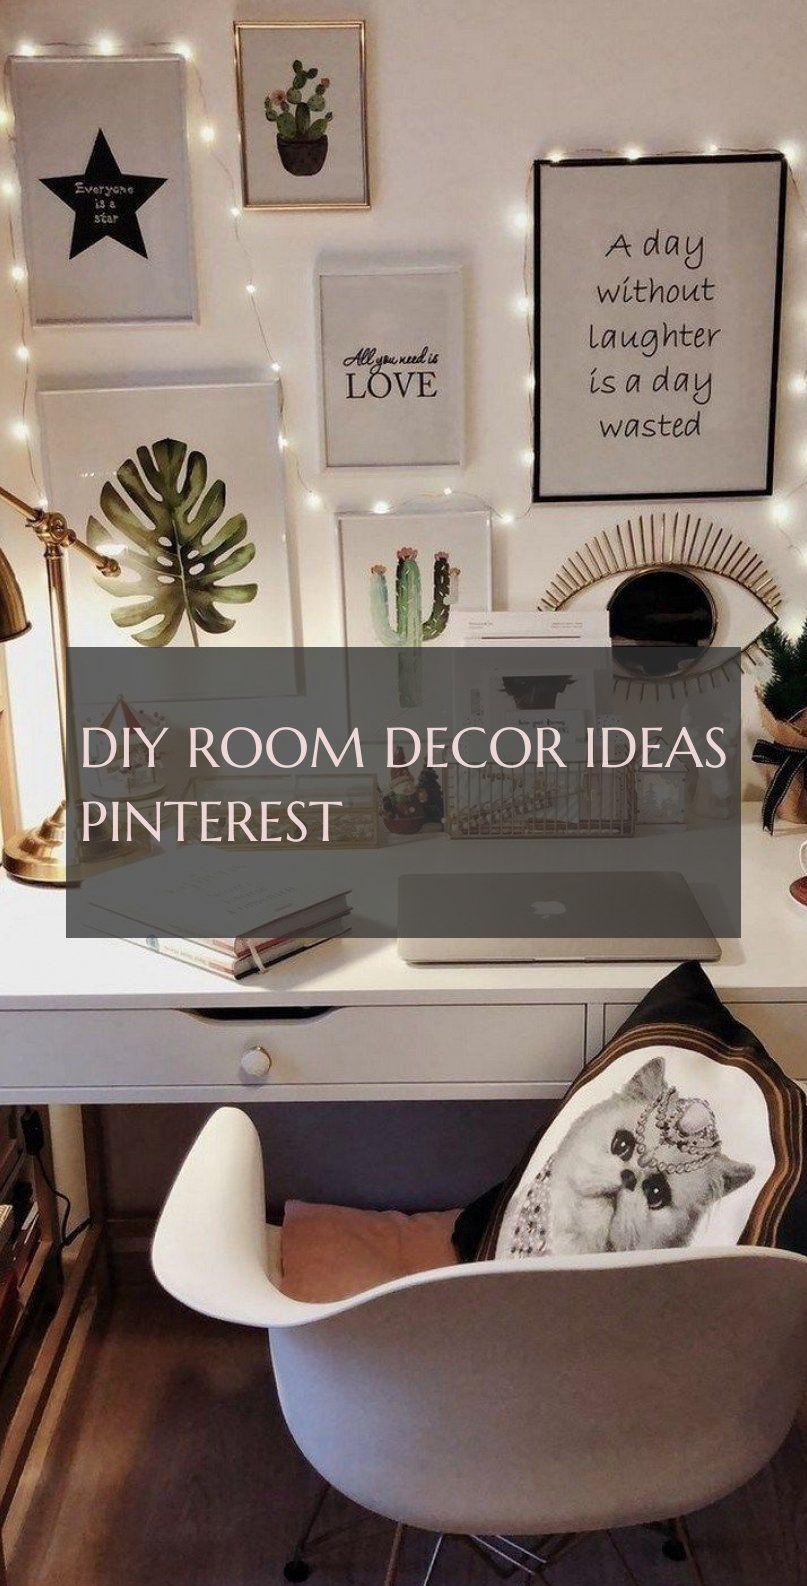 Pin On Room Decor